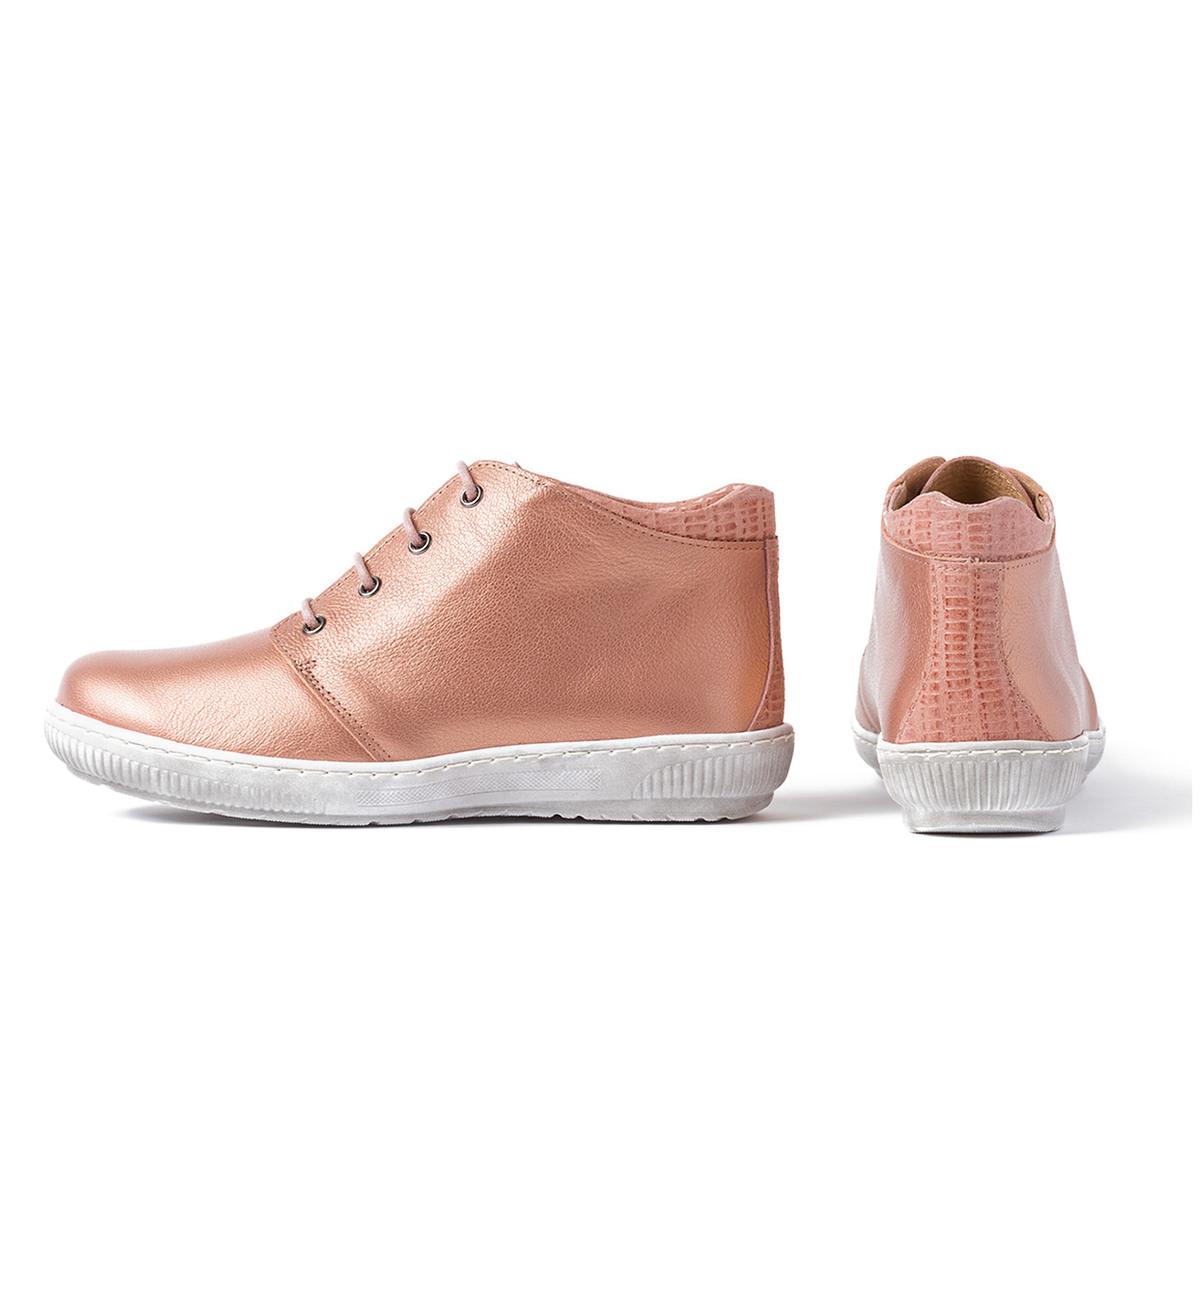 Sneaker Hightop Rosé LaShoe